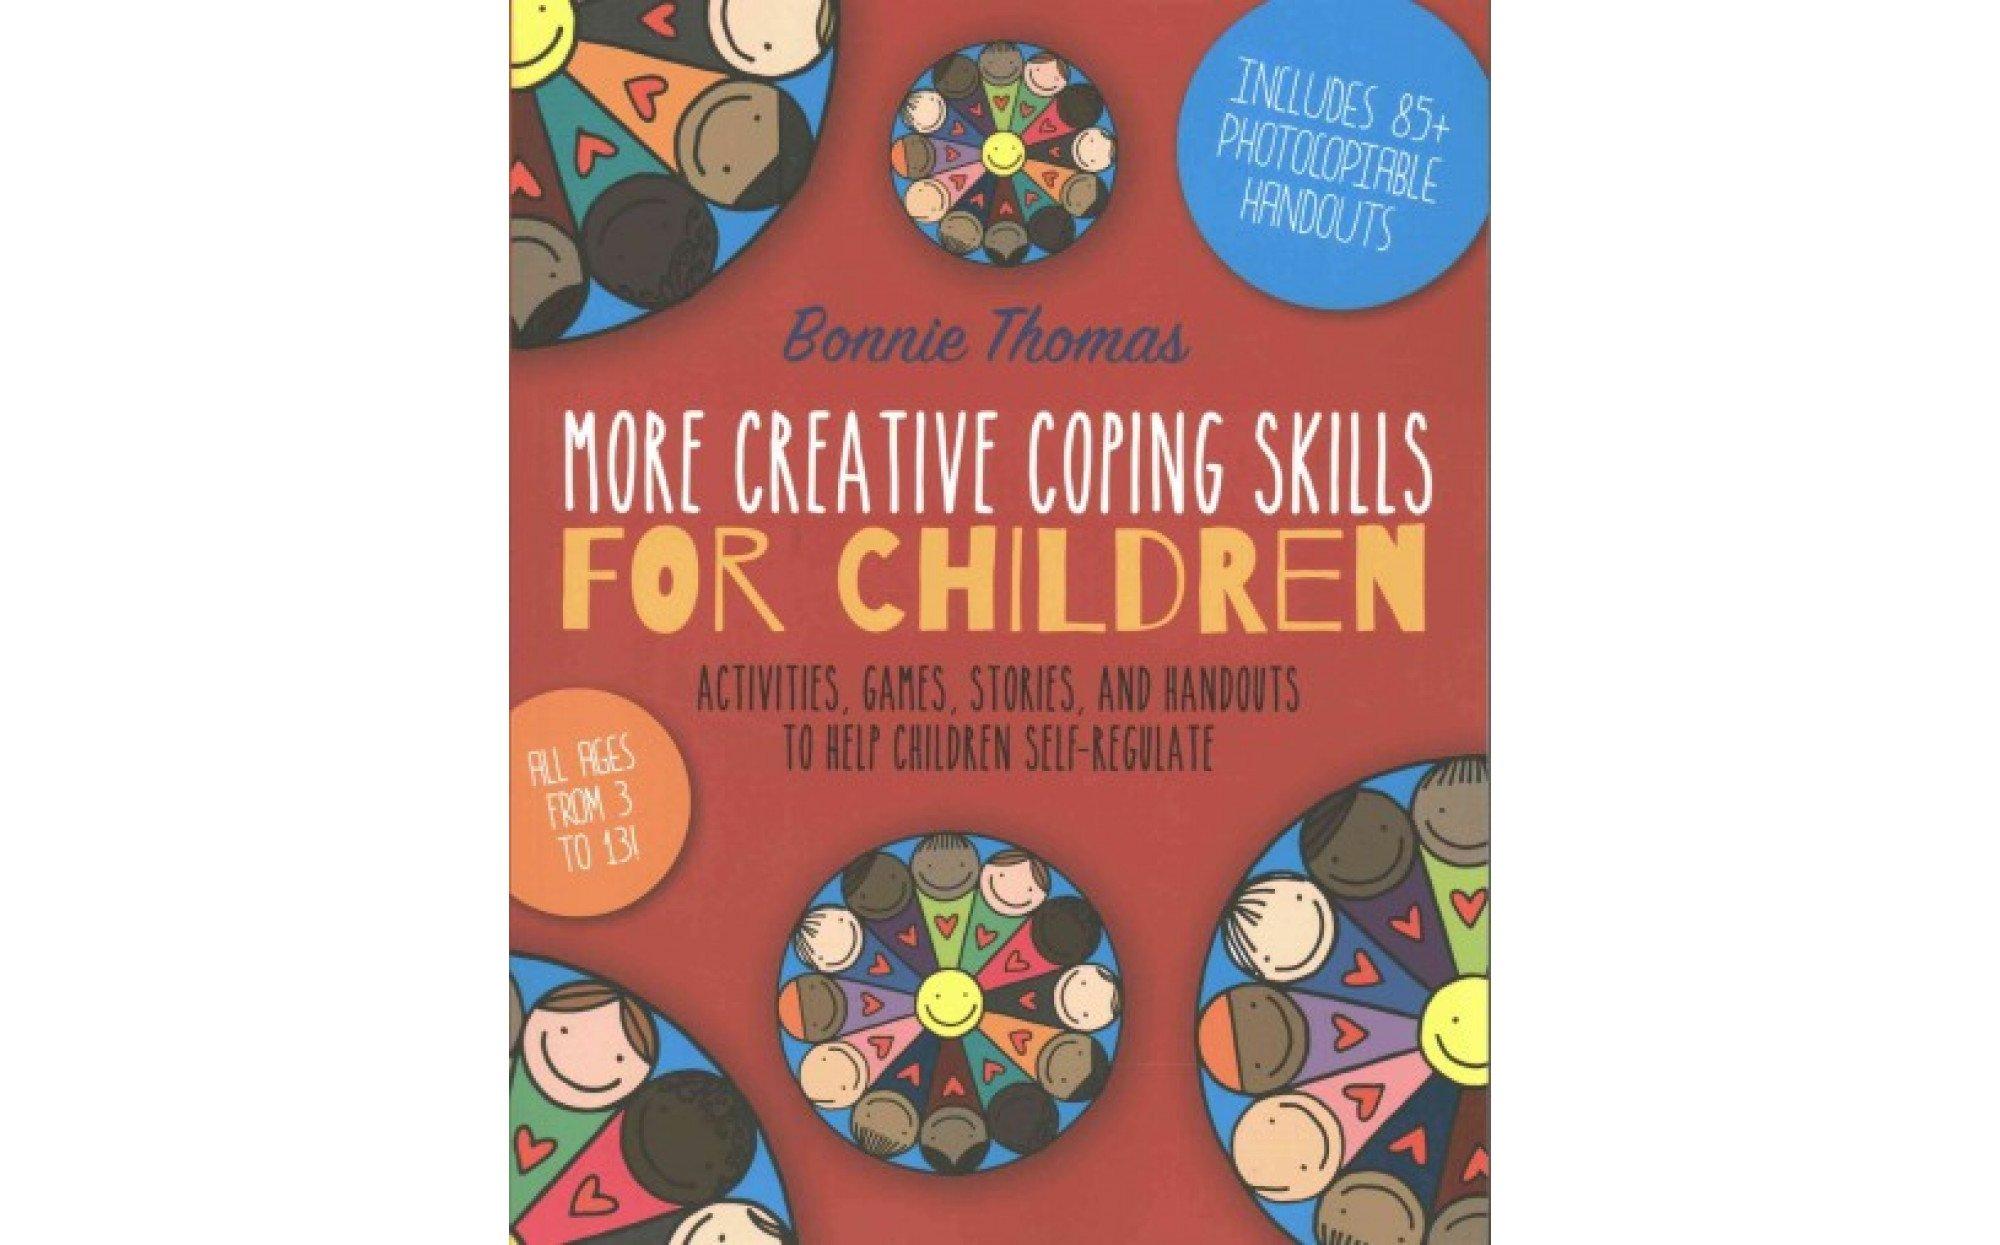 More Creative Coping Skills For Children Activities